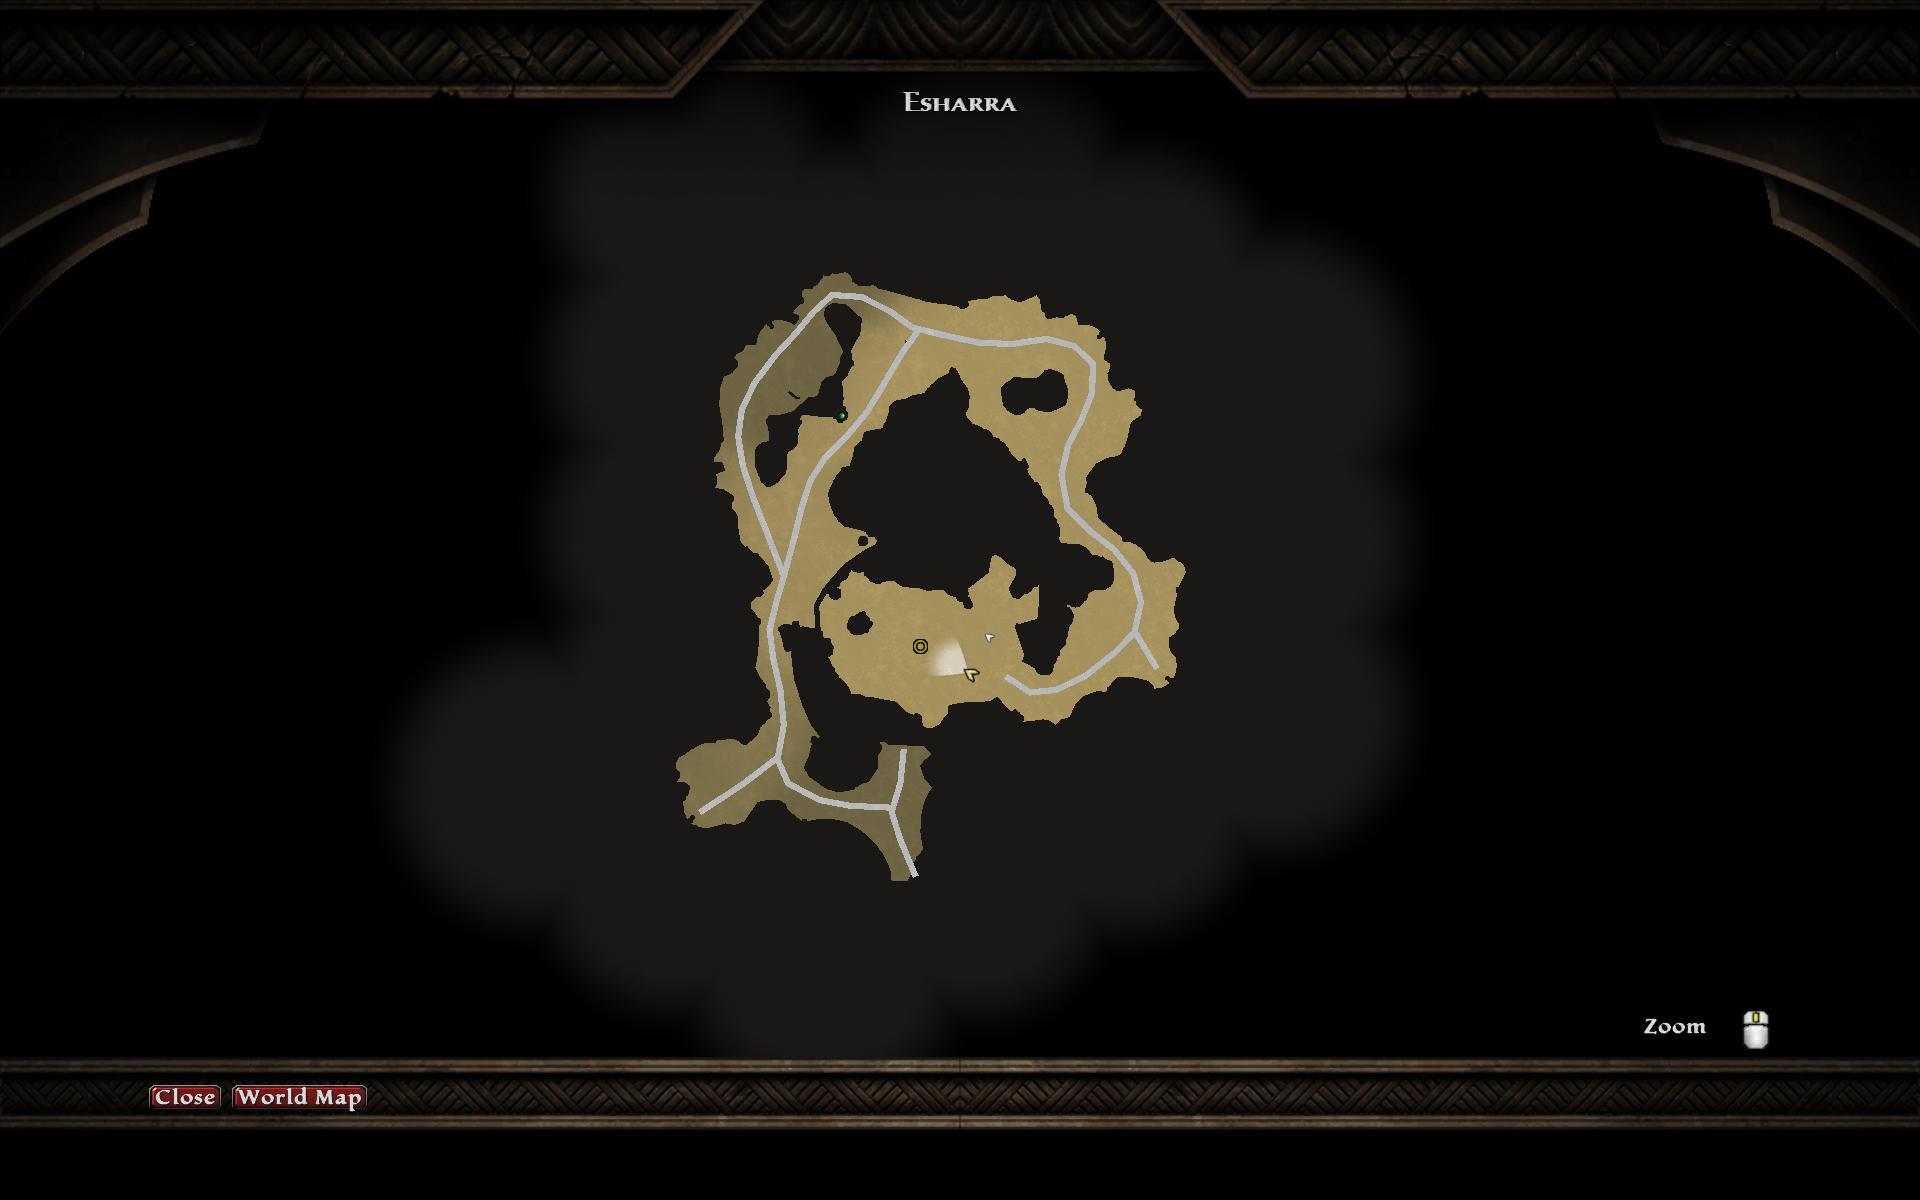 Esharra Map.jpg